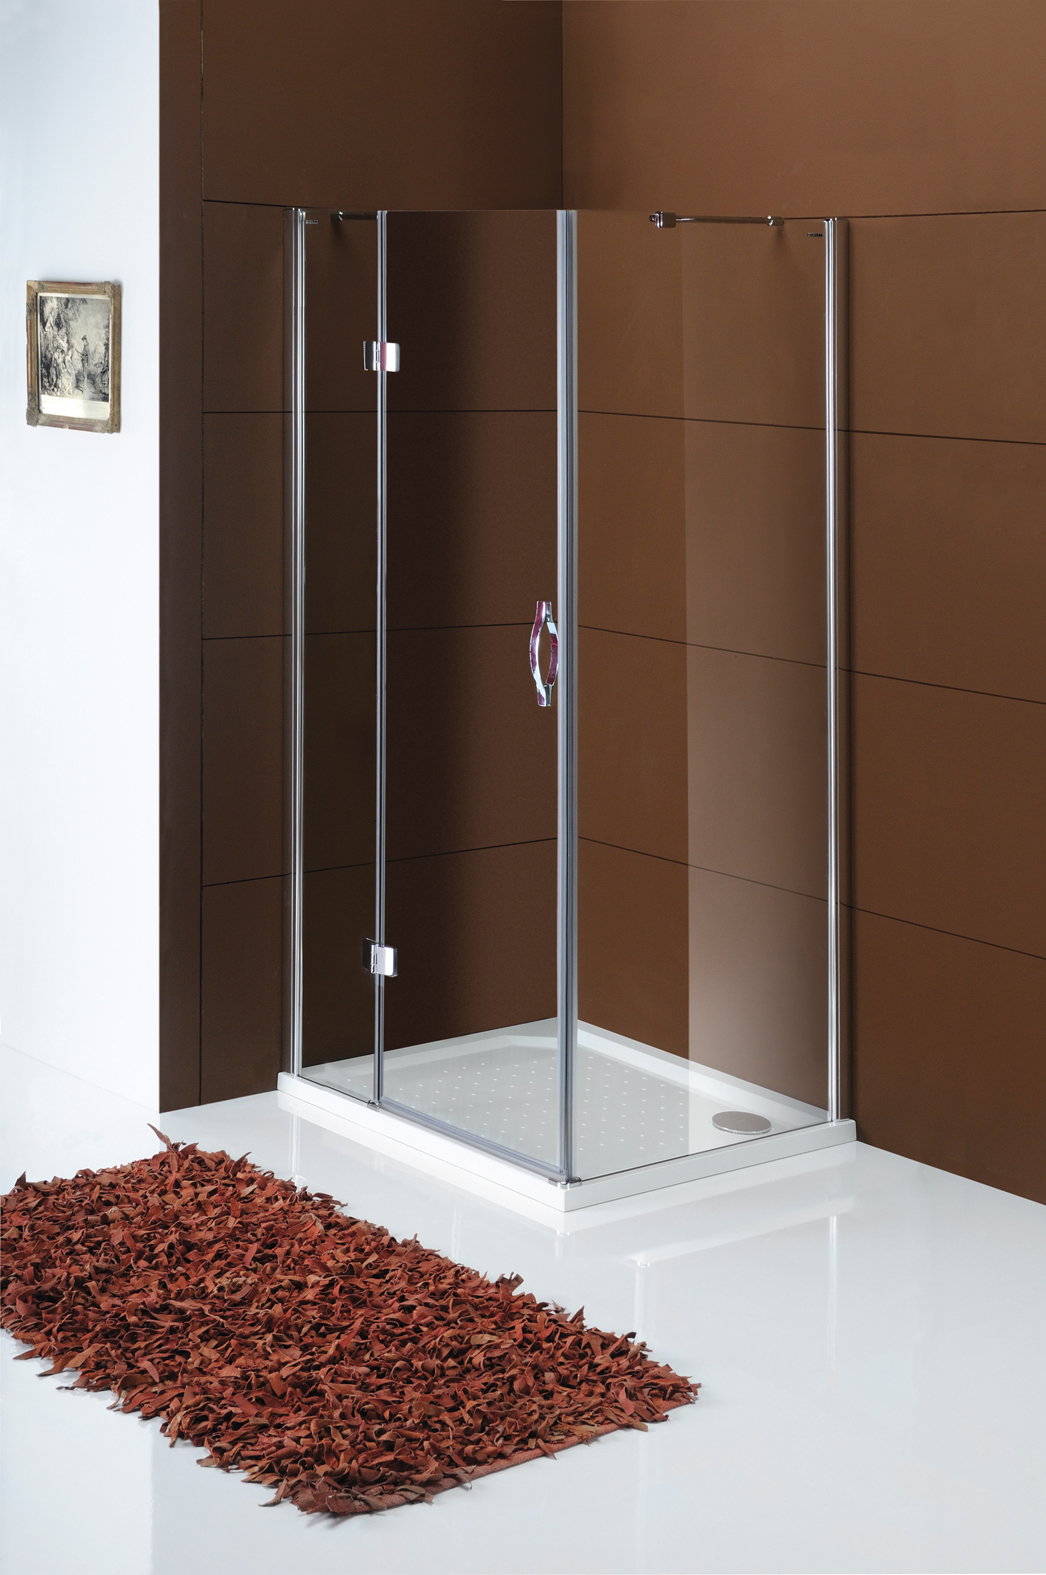 Gelco Sprchové dveře Legro jednodílné otočné 110 cm, sklo čiré/leštěný GL1111